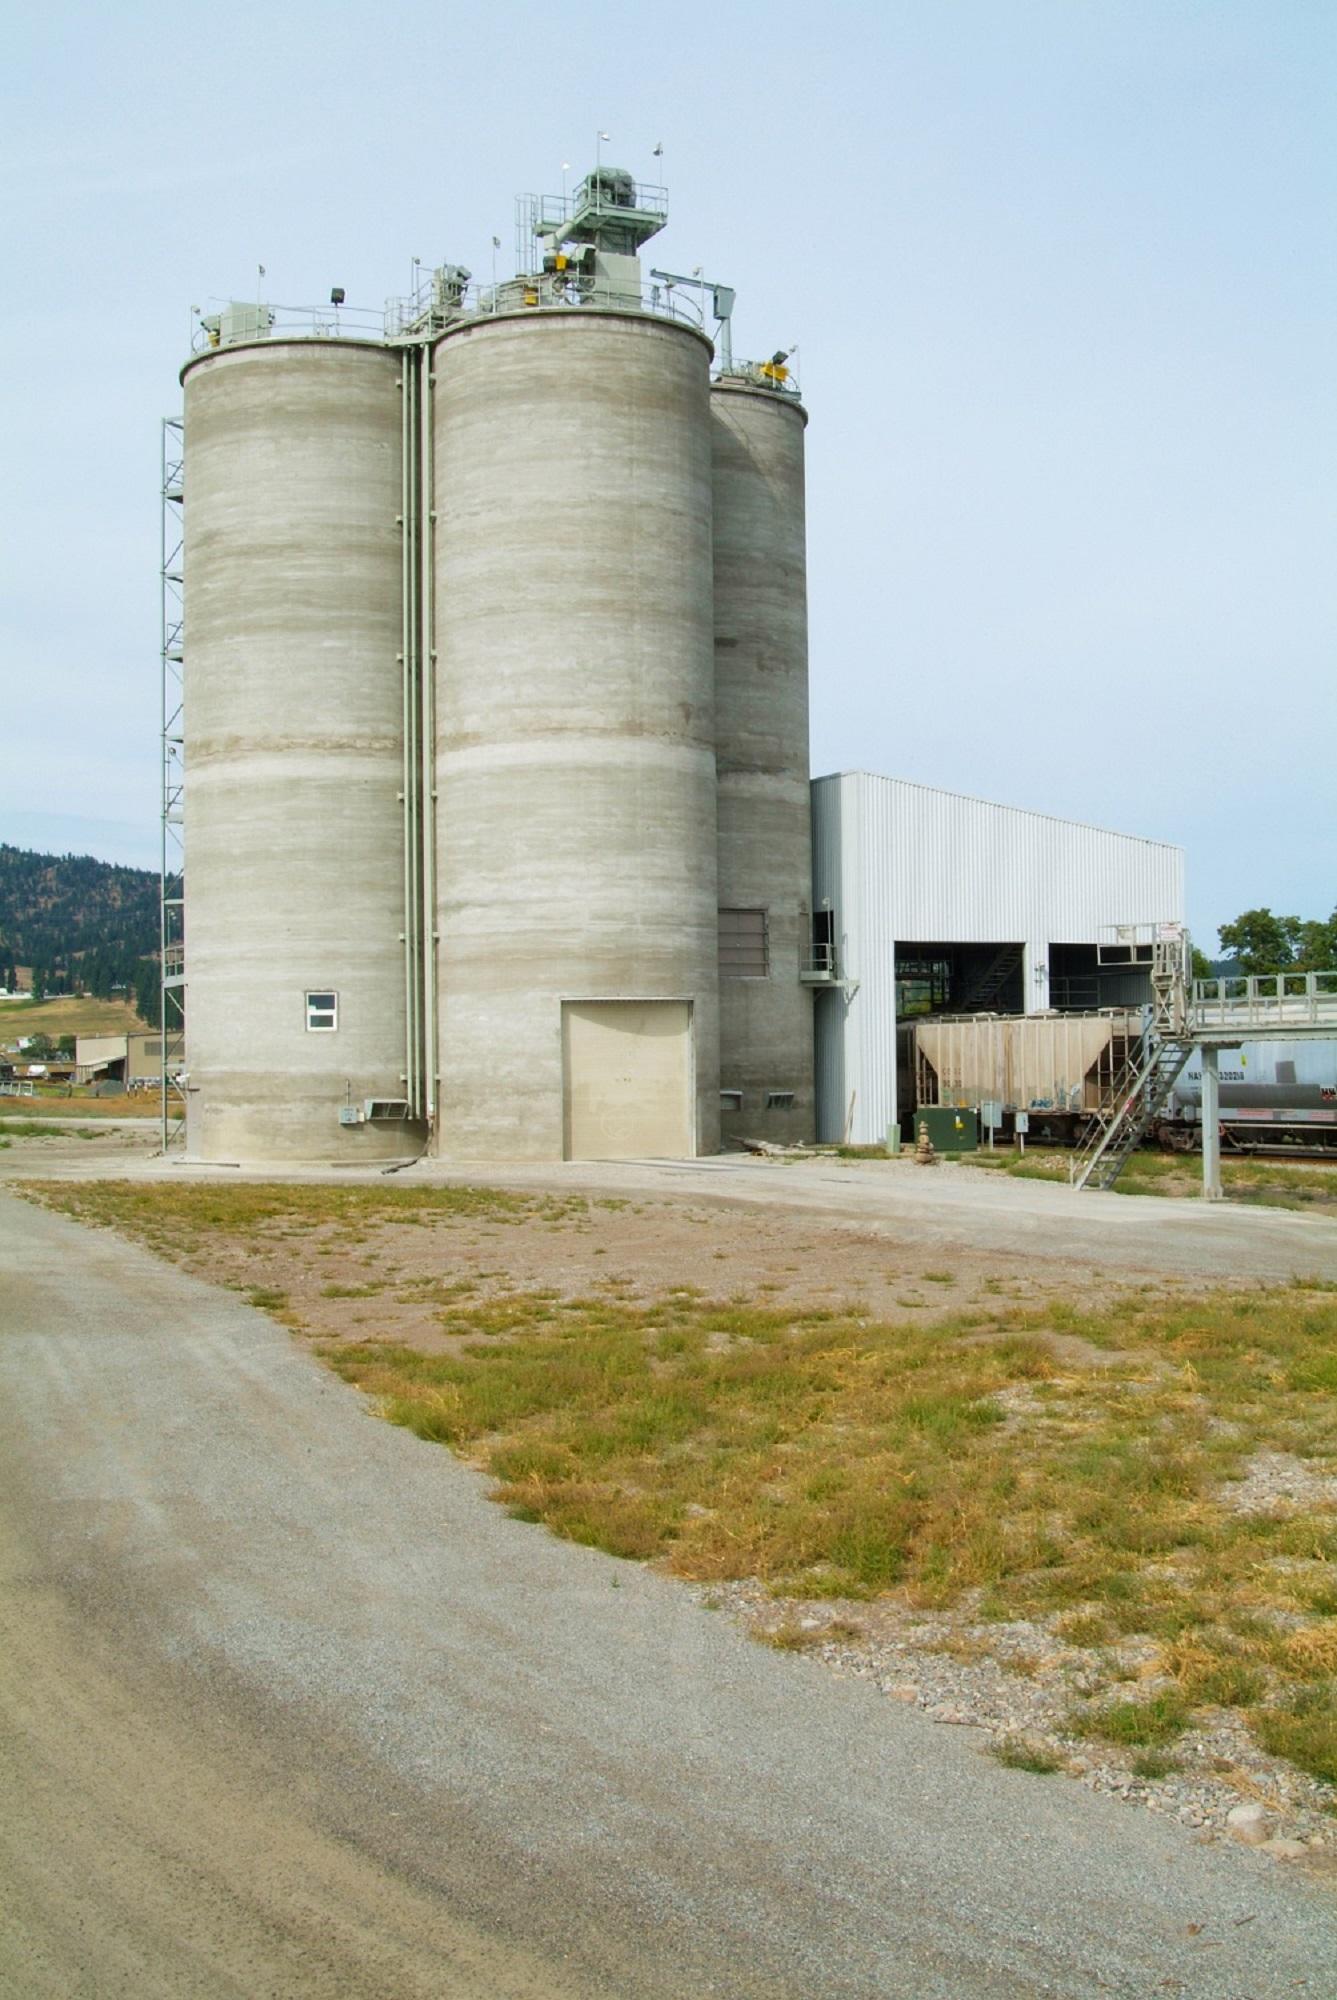 LaFarge Spokane_1 5650 ton slipform concrete storage structure Ag-industrial Industrial Slipform Rail receiving Truck unload Silo aeration